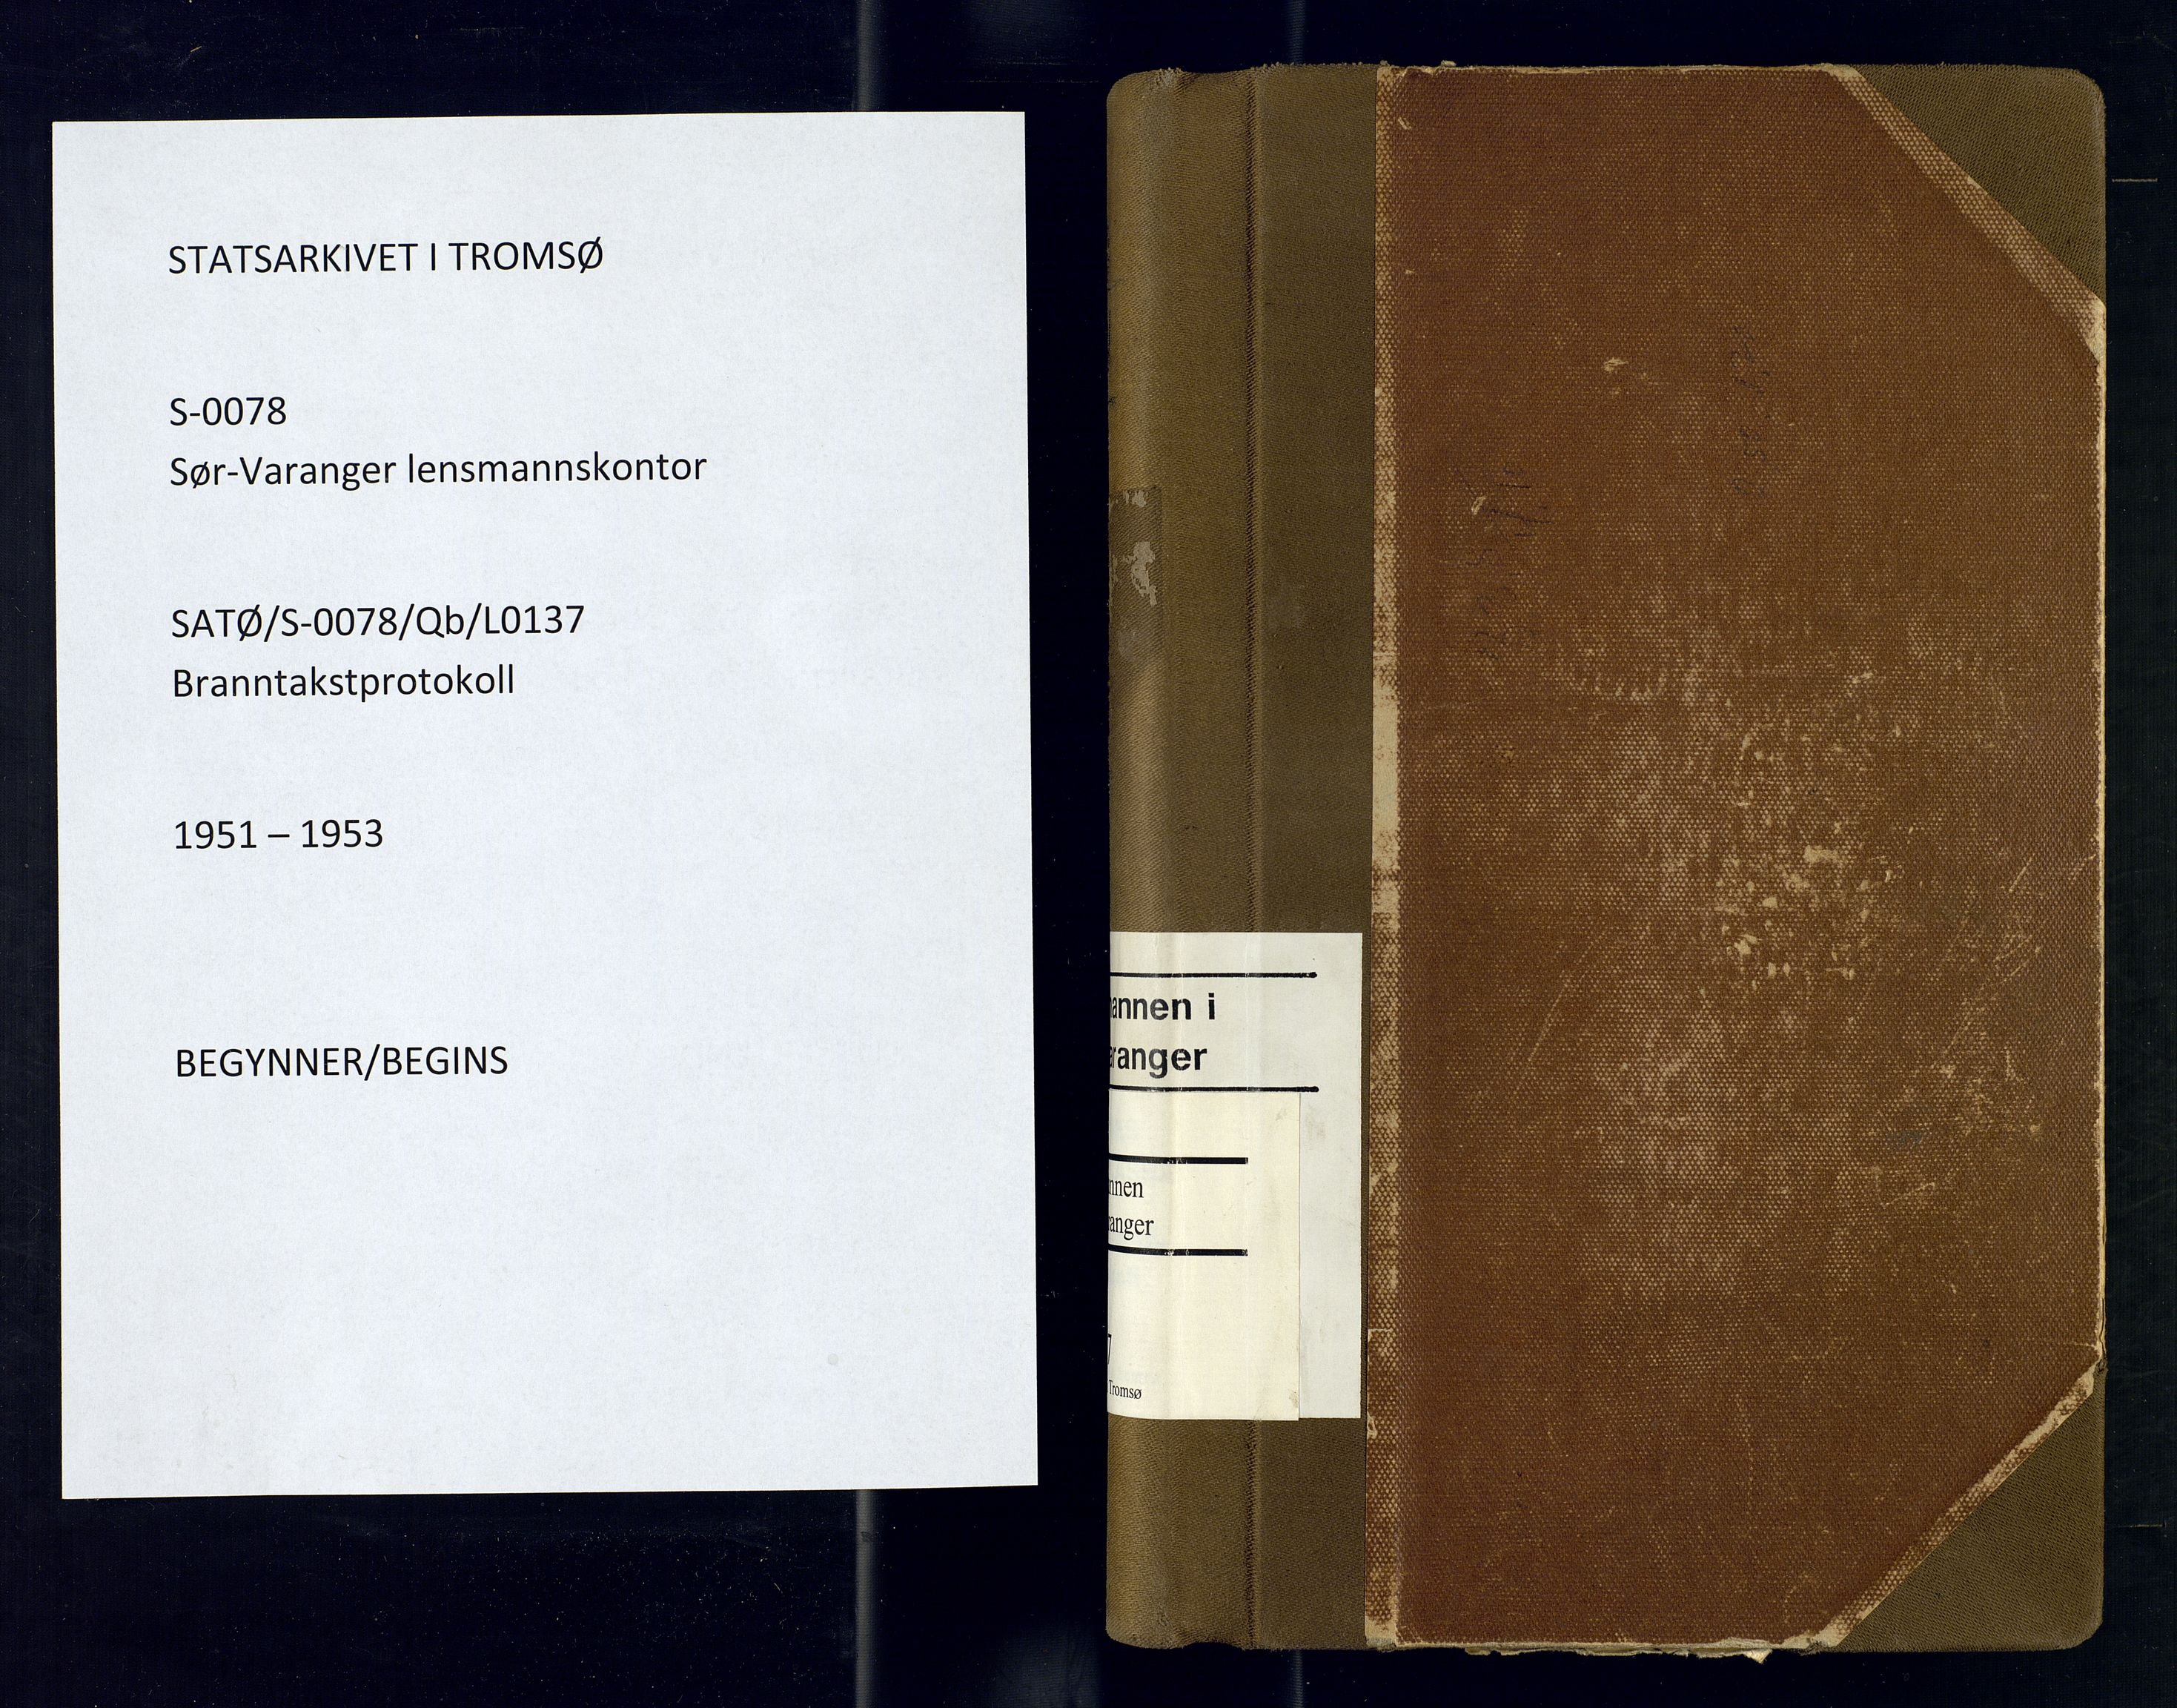 SATØ, Sør-Varanger lensmannskontor, Qb/L0137: Branntakstprotokoller Med reg., 1951-1953